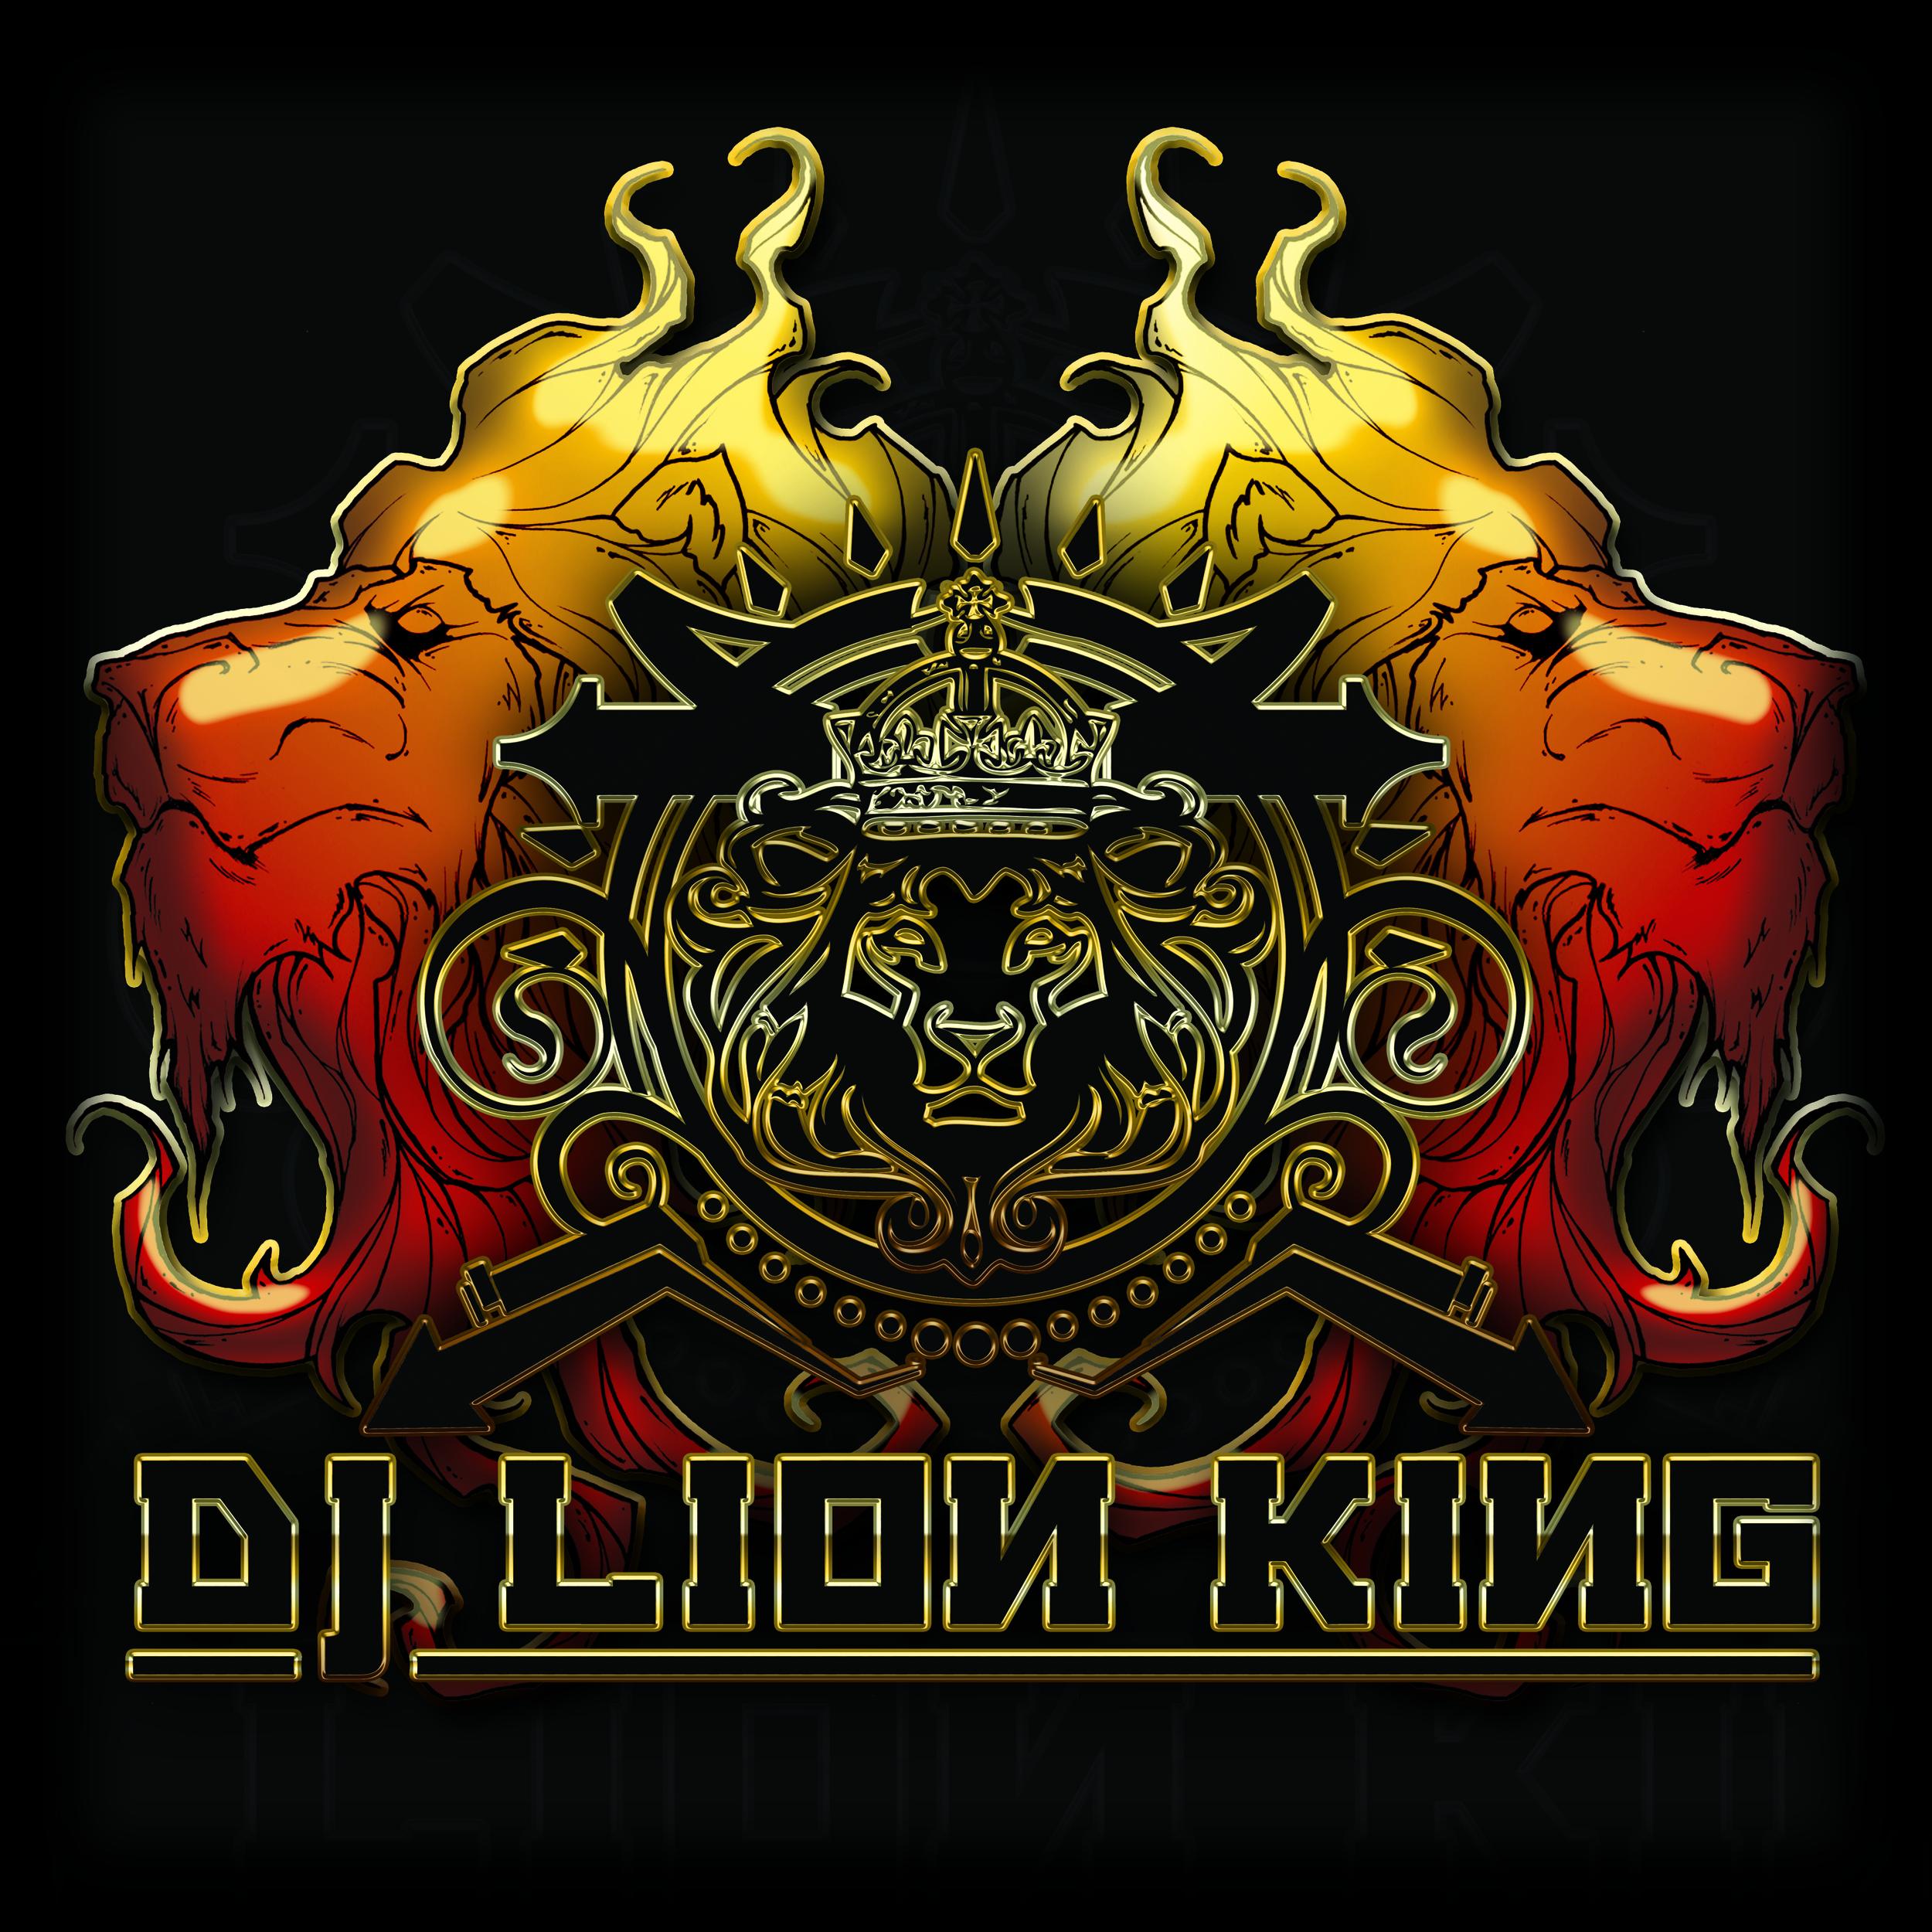 CT WEDDING DJ | Fairfield County DJ | New Haven County DJ